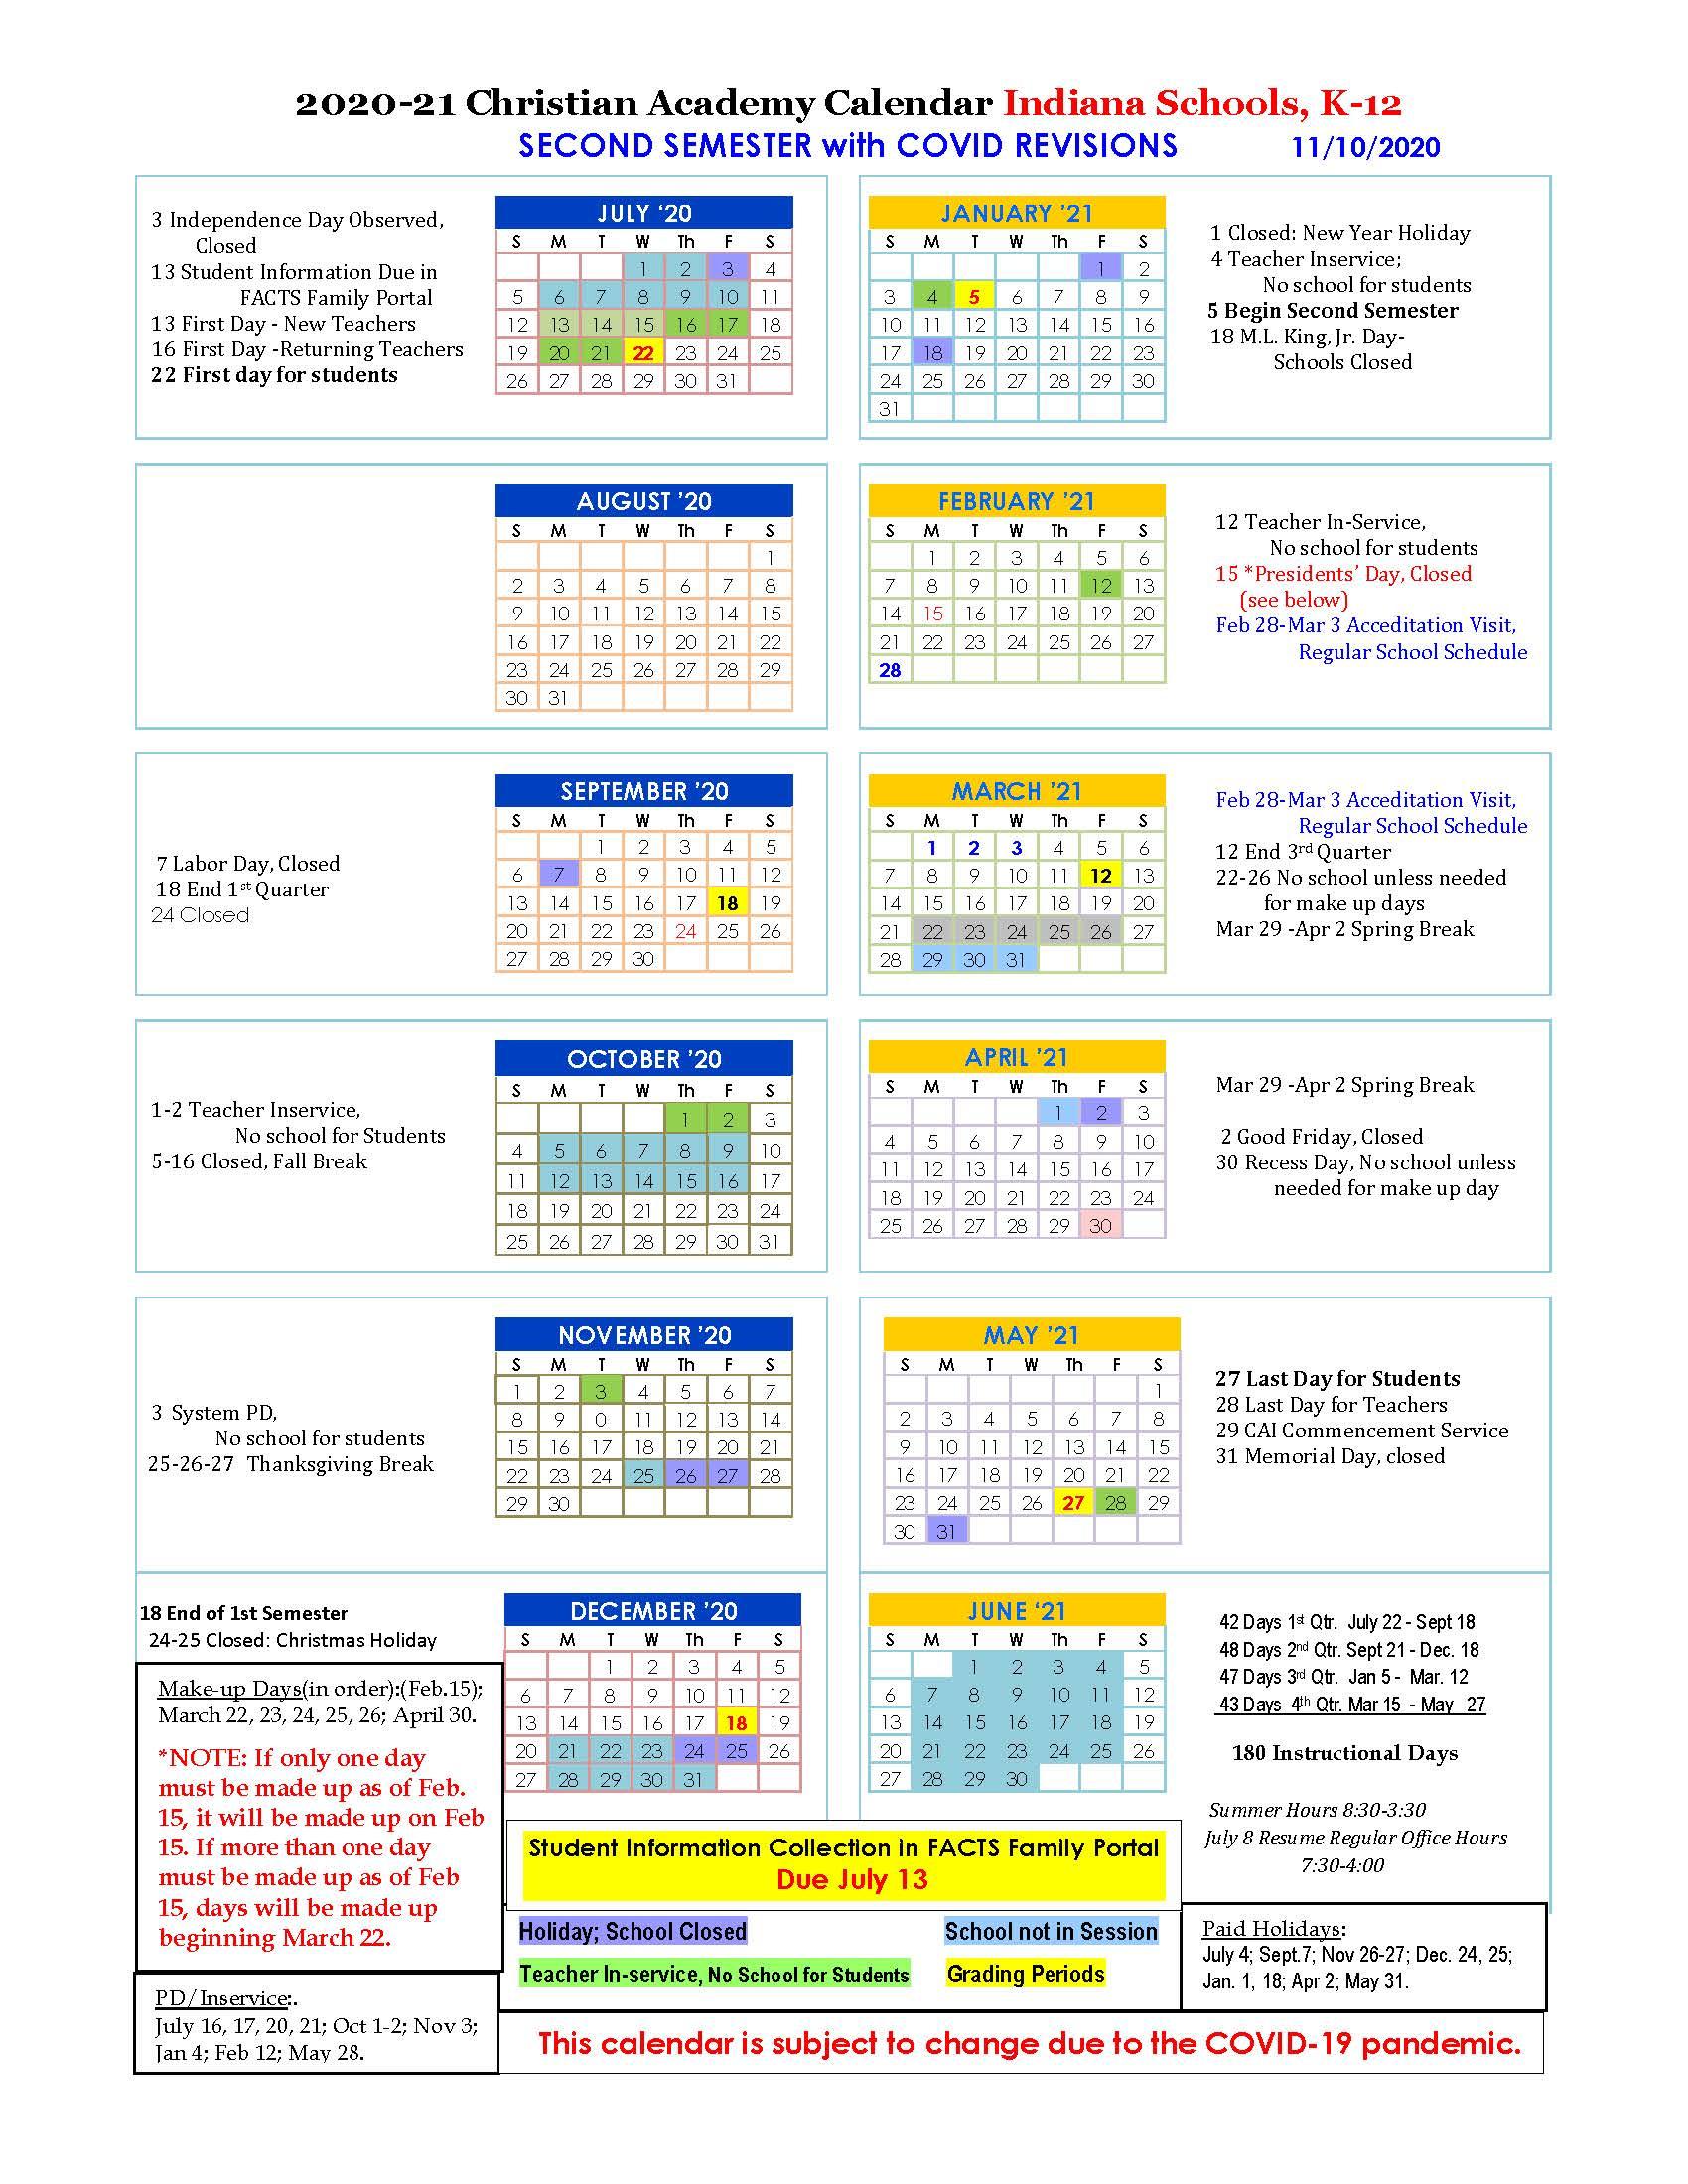 Christian Academy School System | Christian Academy of Indiana | 2020-2021 Second Semester Family Calendar